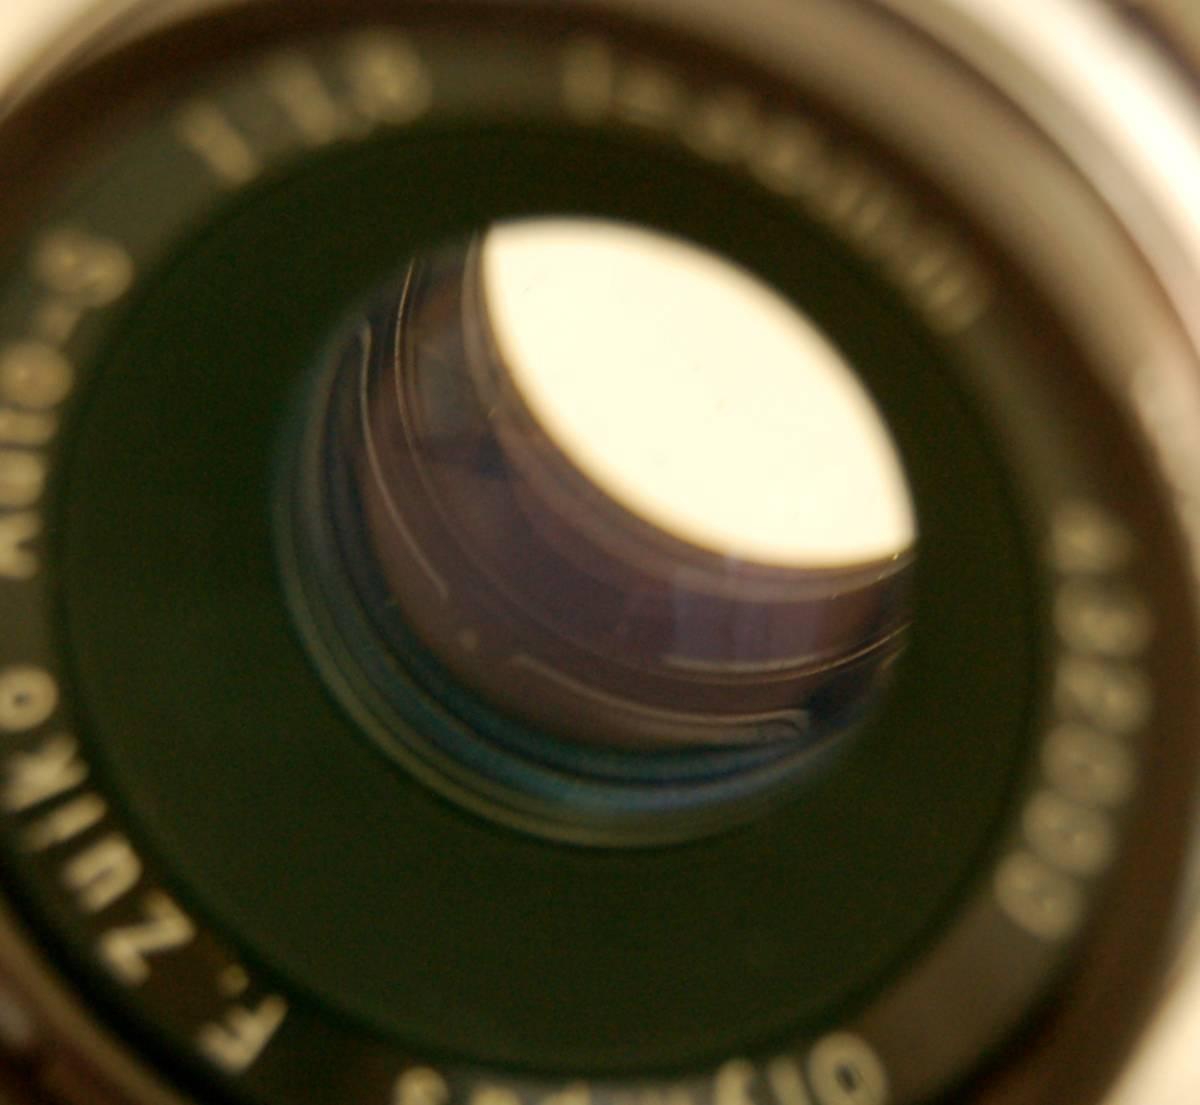 OLYMPUS オリンパス PEN-FT ペン ボディ F.Zuiko Auto-S 1:1.8 f=38mm レンズ 1円から_画像9